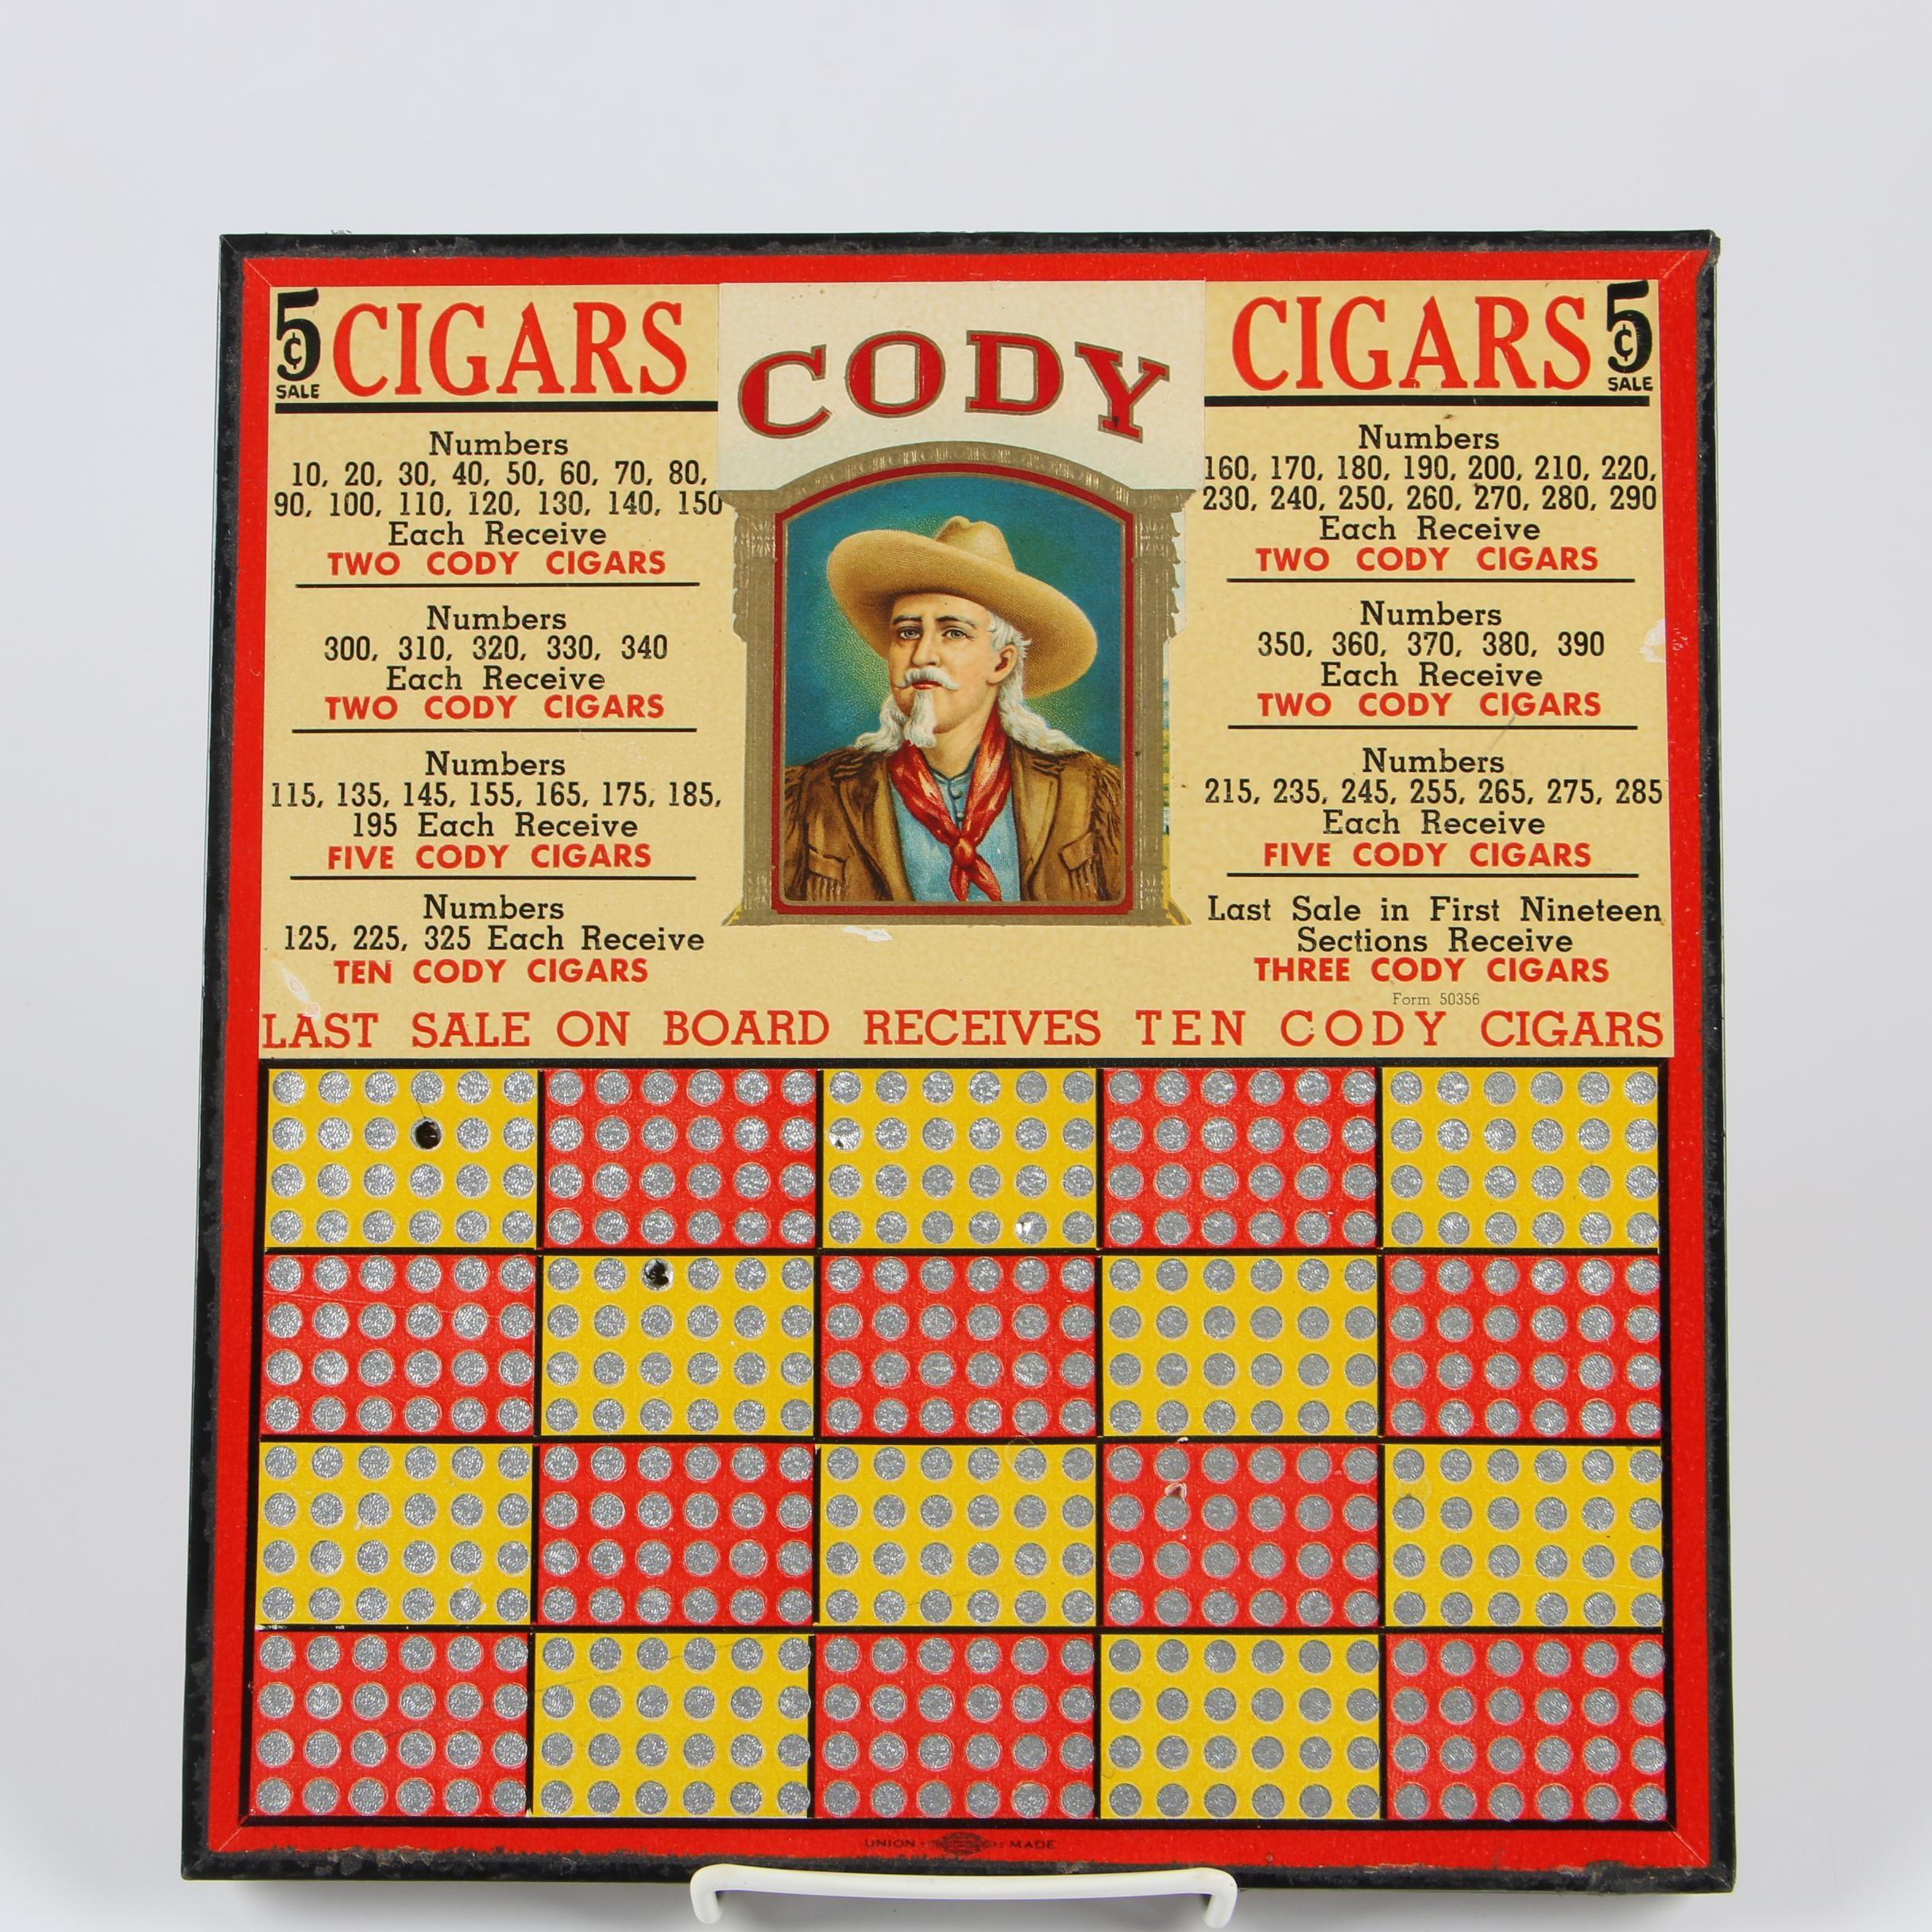 Hamilton Mfg. Co. Cody Cigars Advertising Punchboard, Mid-Century